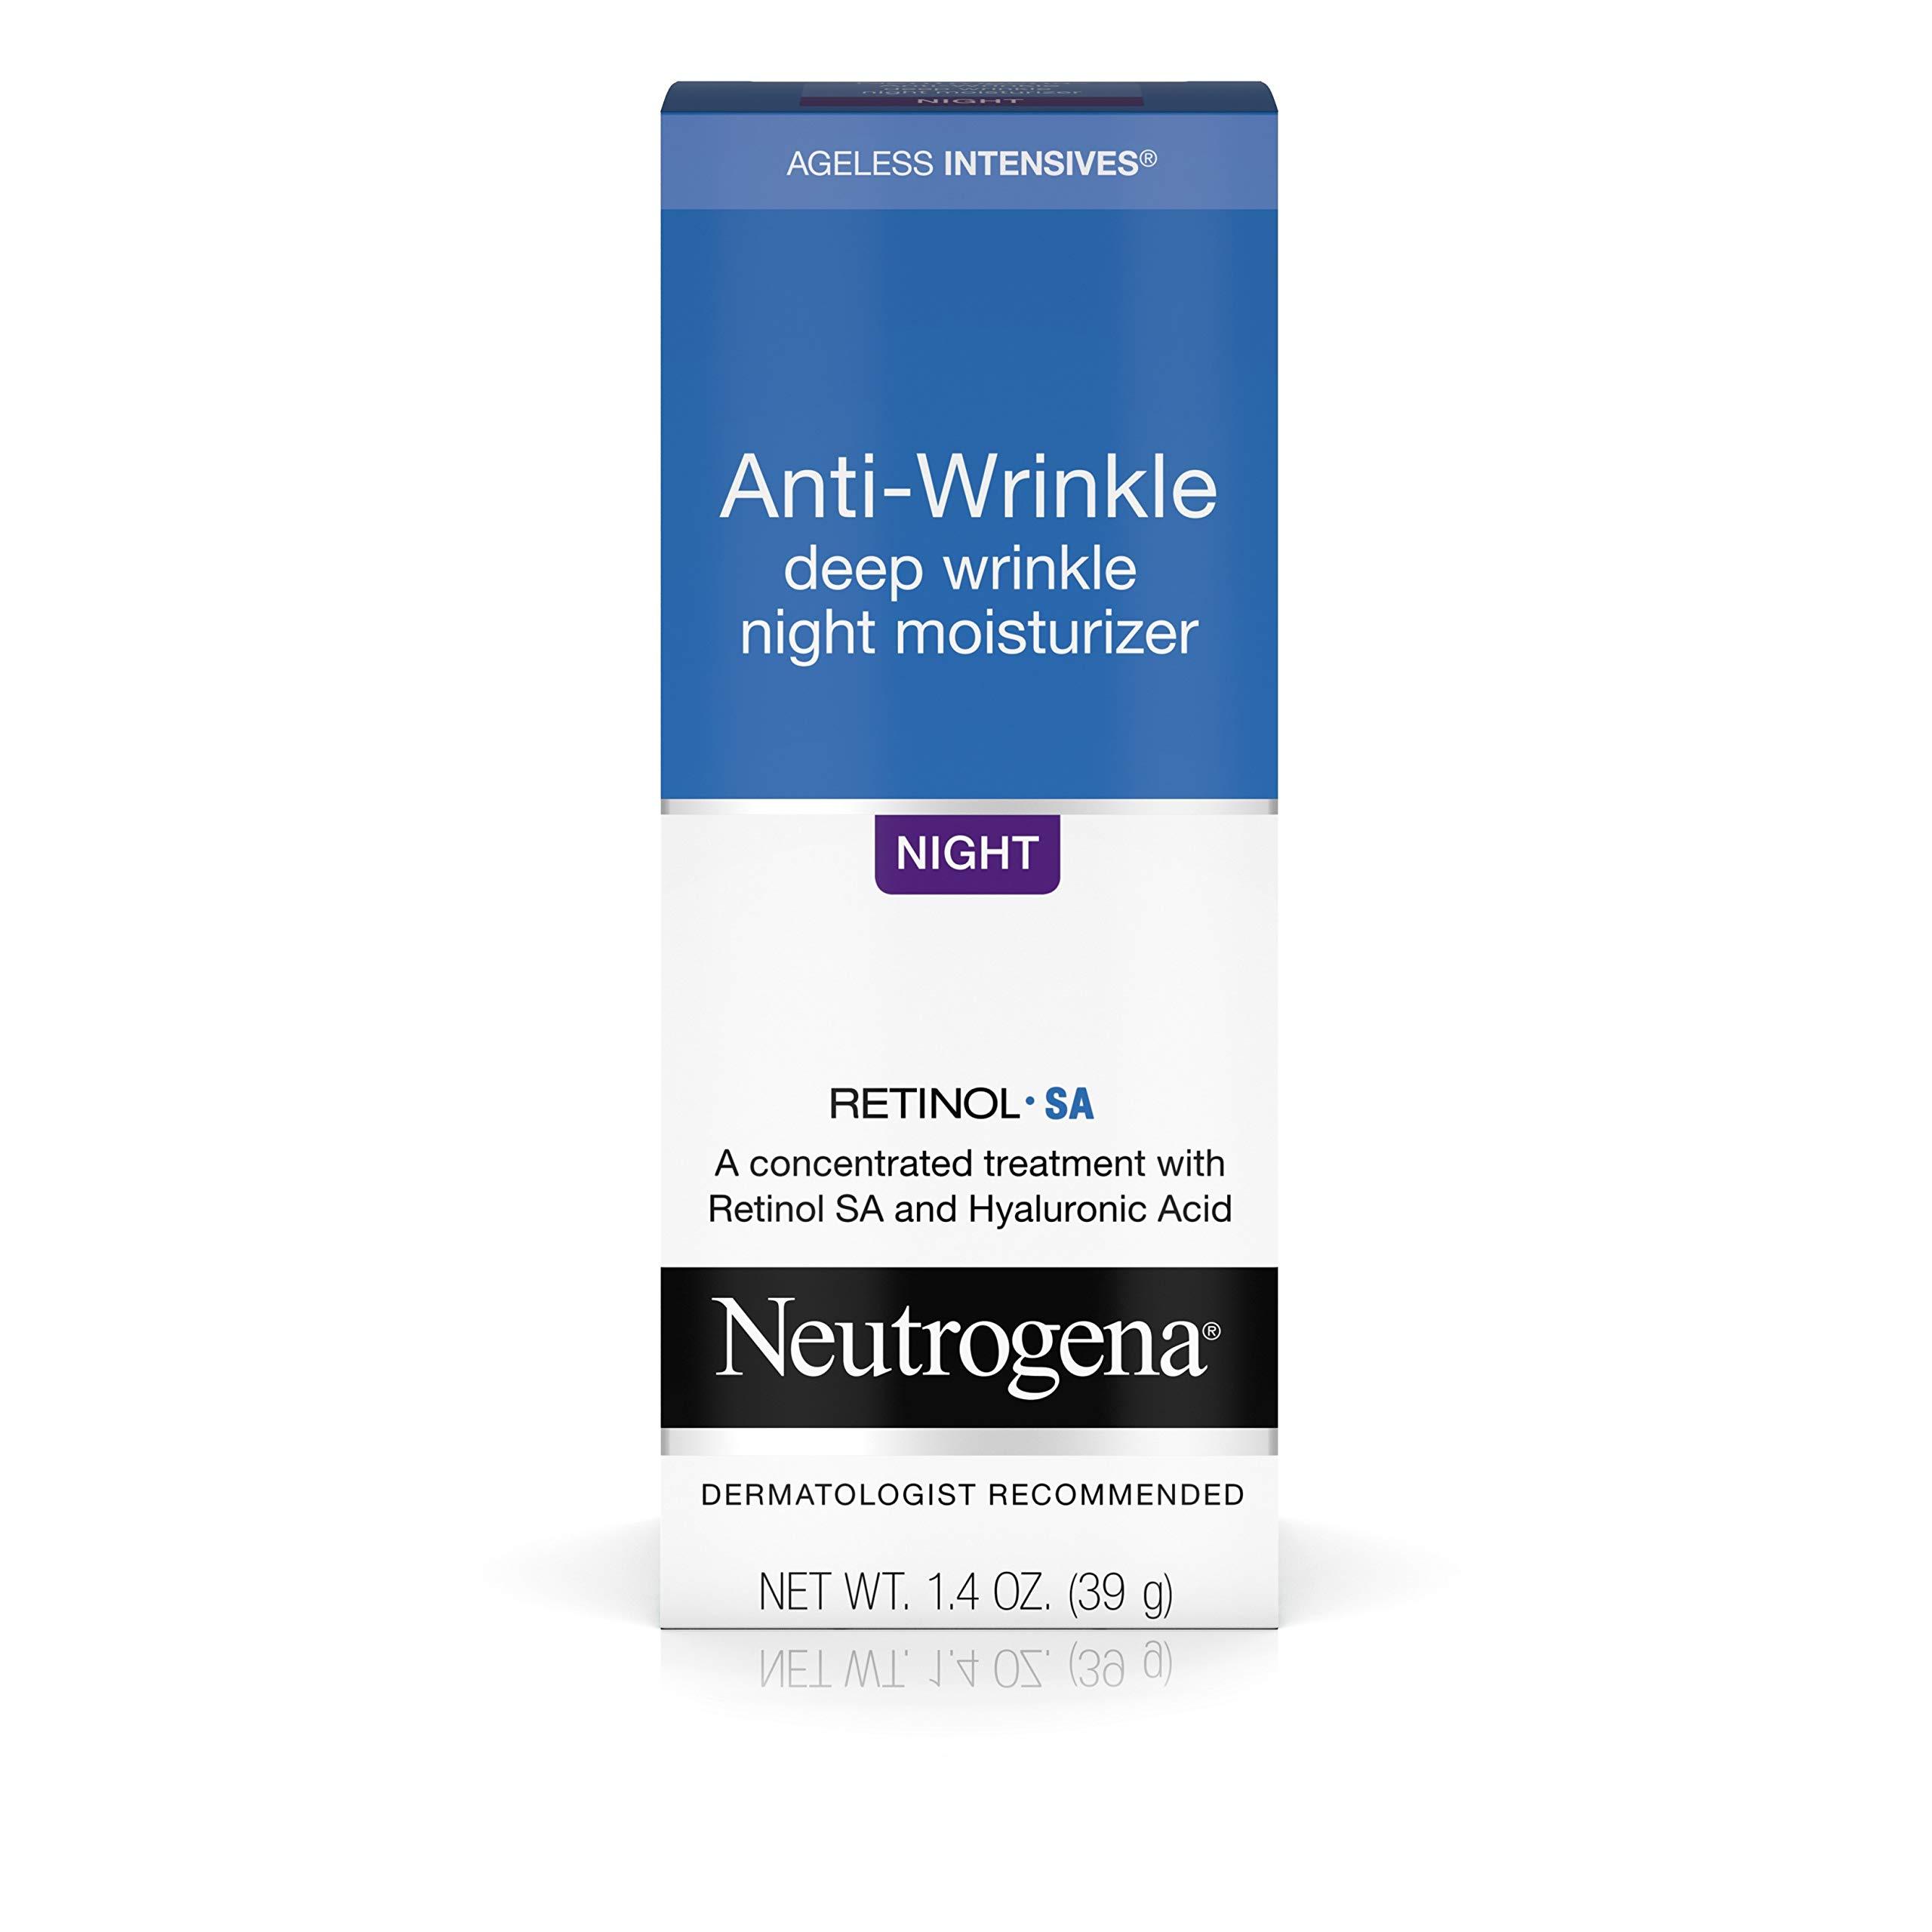 Neutrogena Intensives Anti Wrinkle Moisturizer Hyaluronic